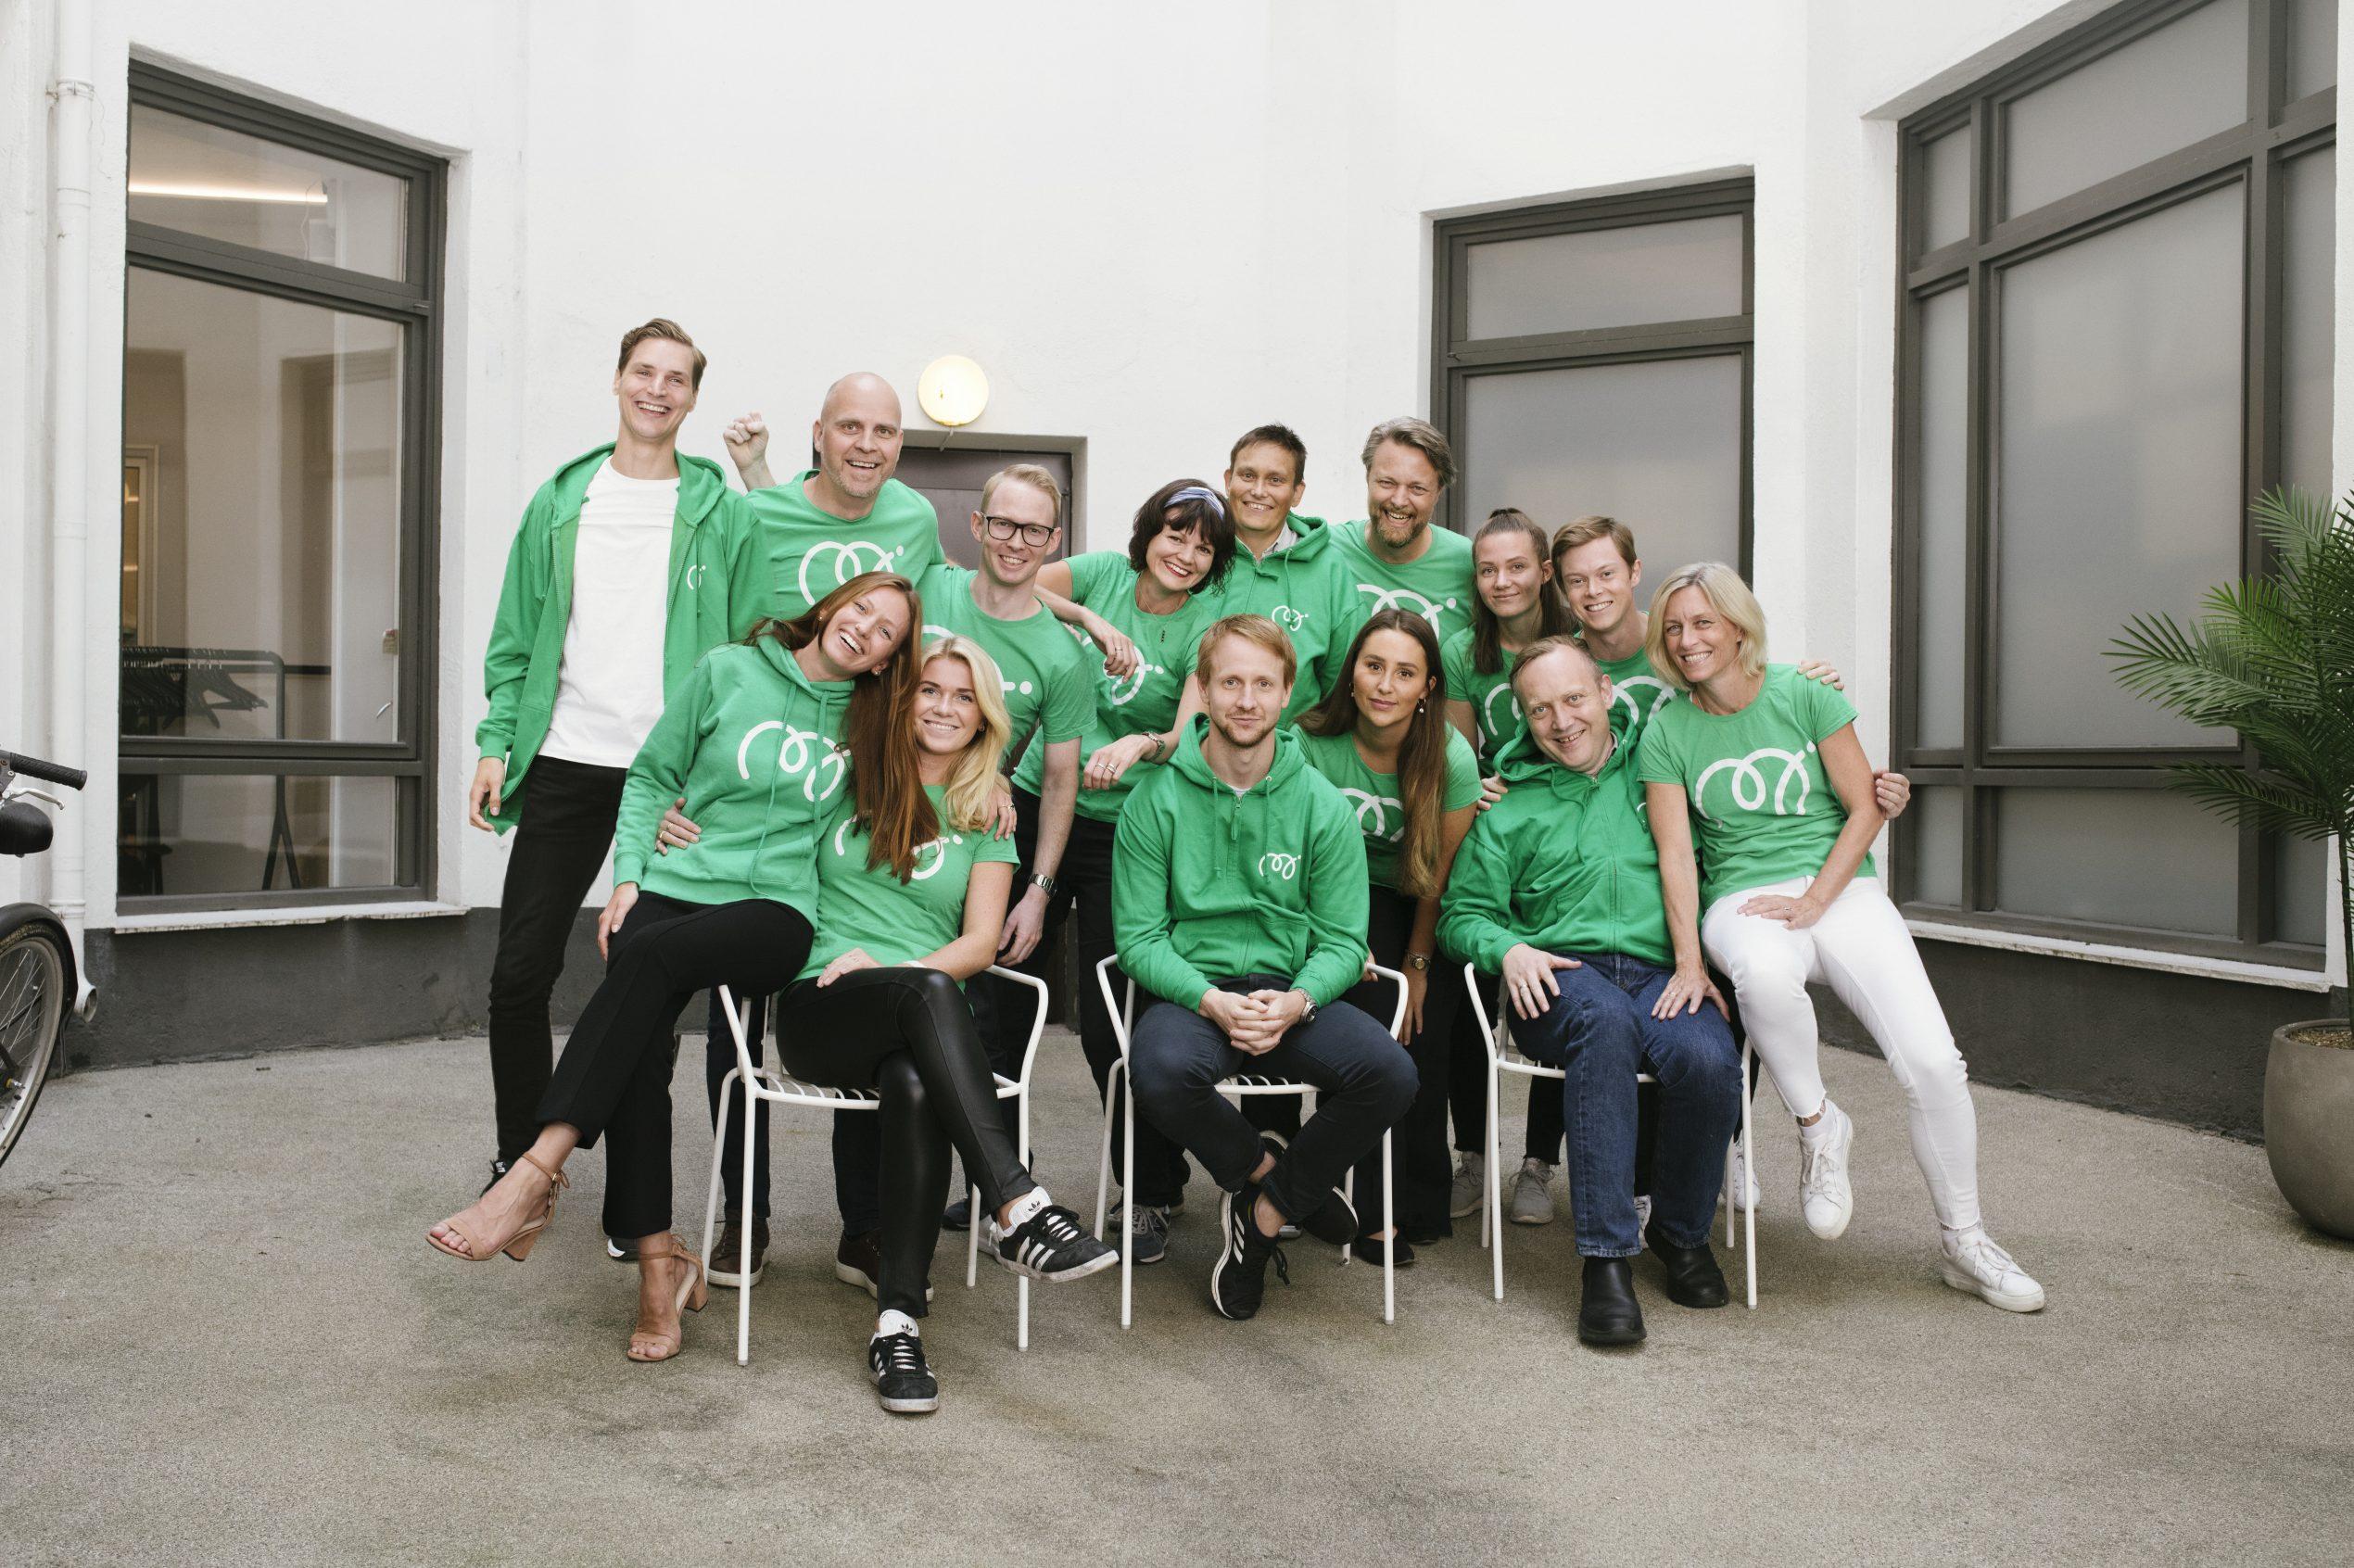 Monner team - photo